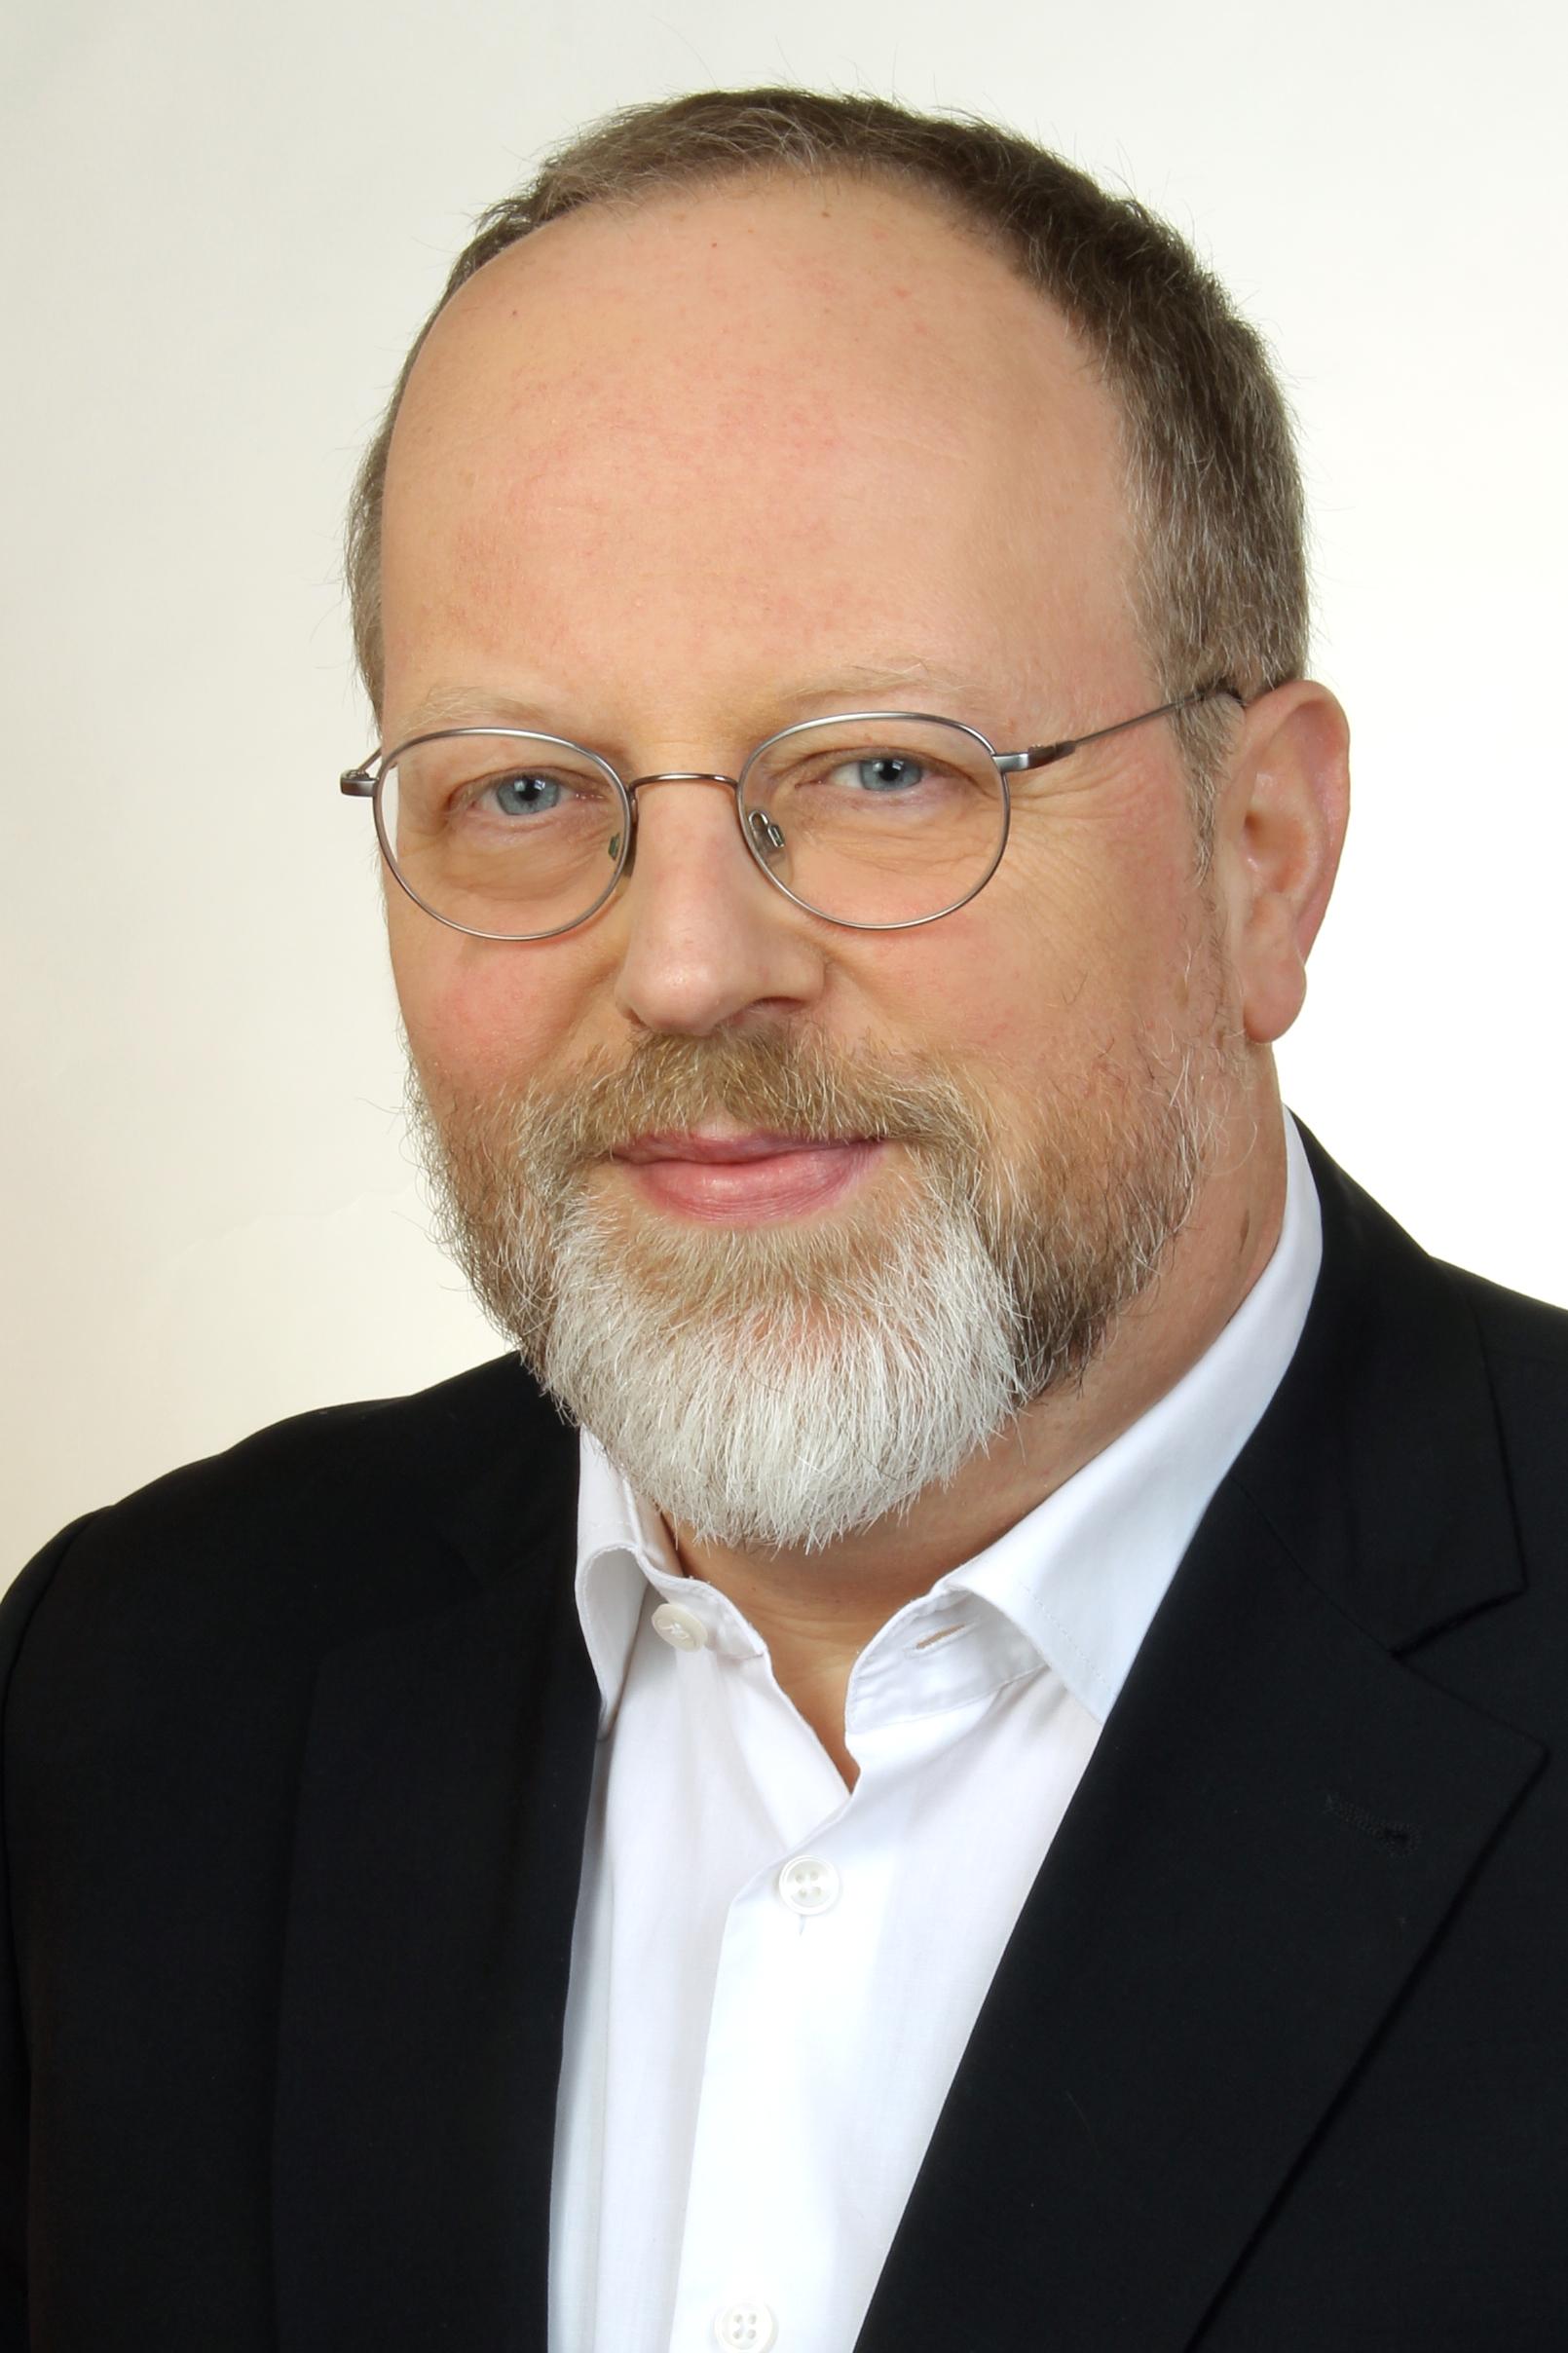 Dr. Jörg Tänzer